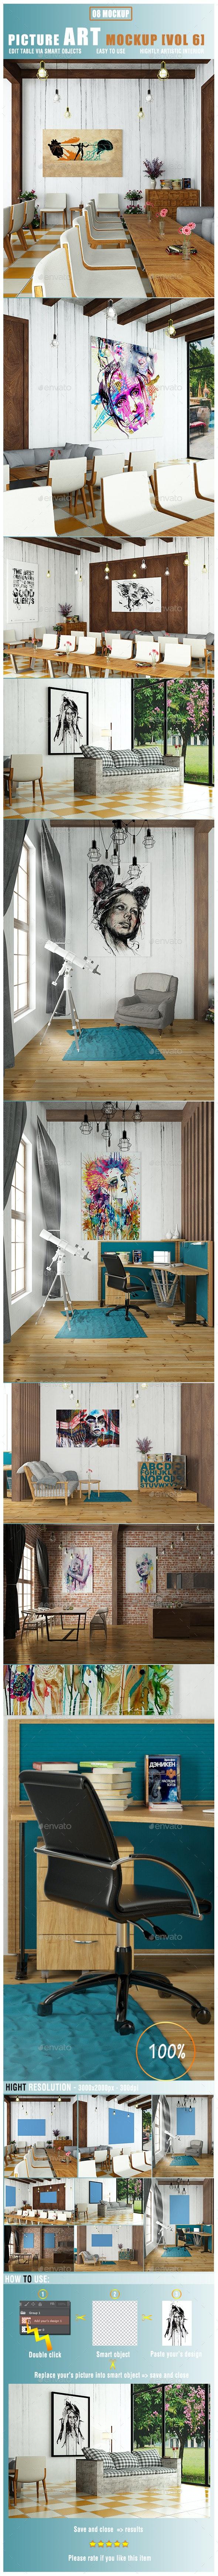 Picture Art Mockup [Vol 6] - Posters Print